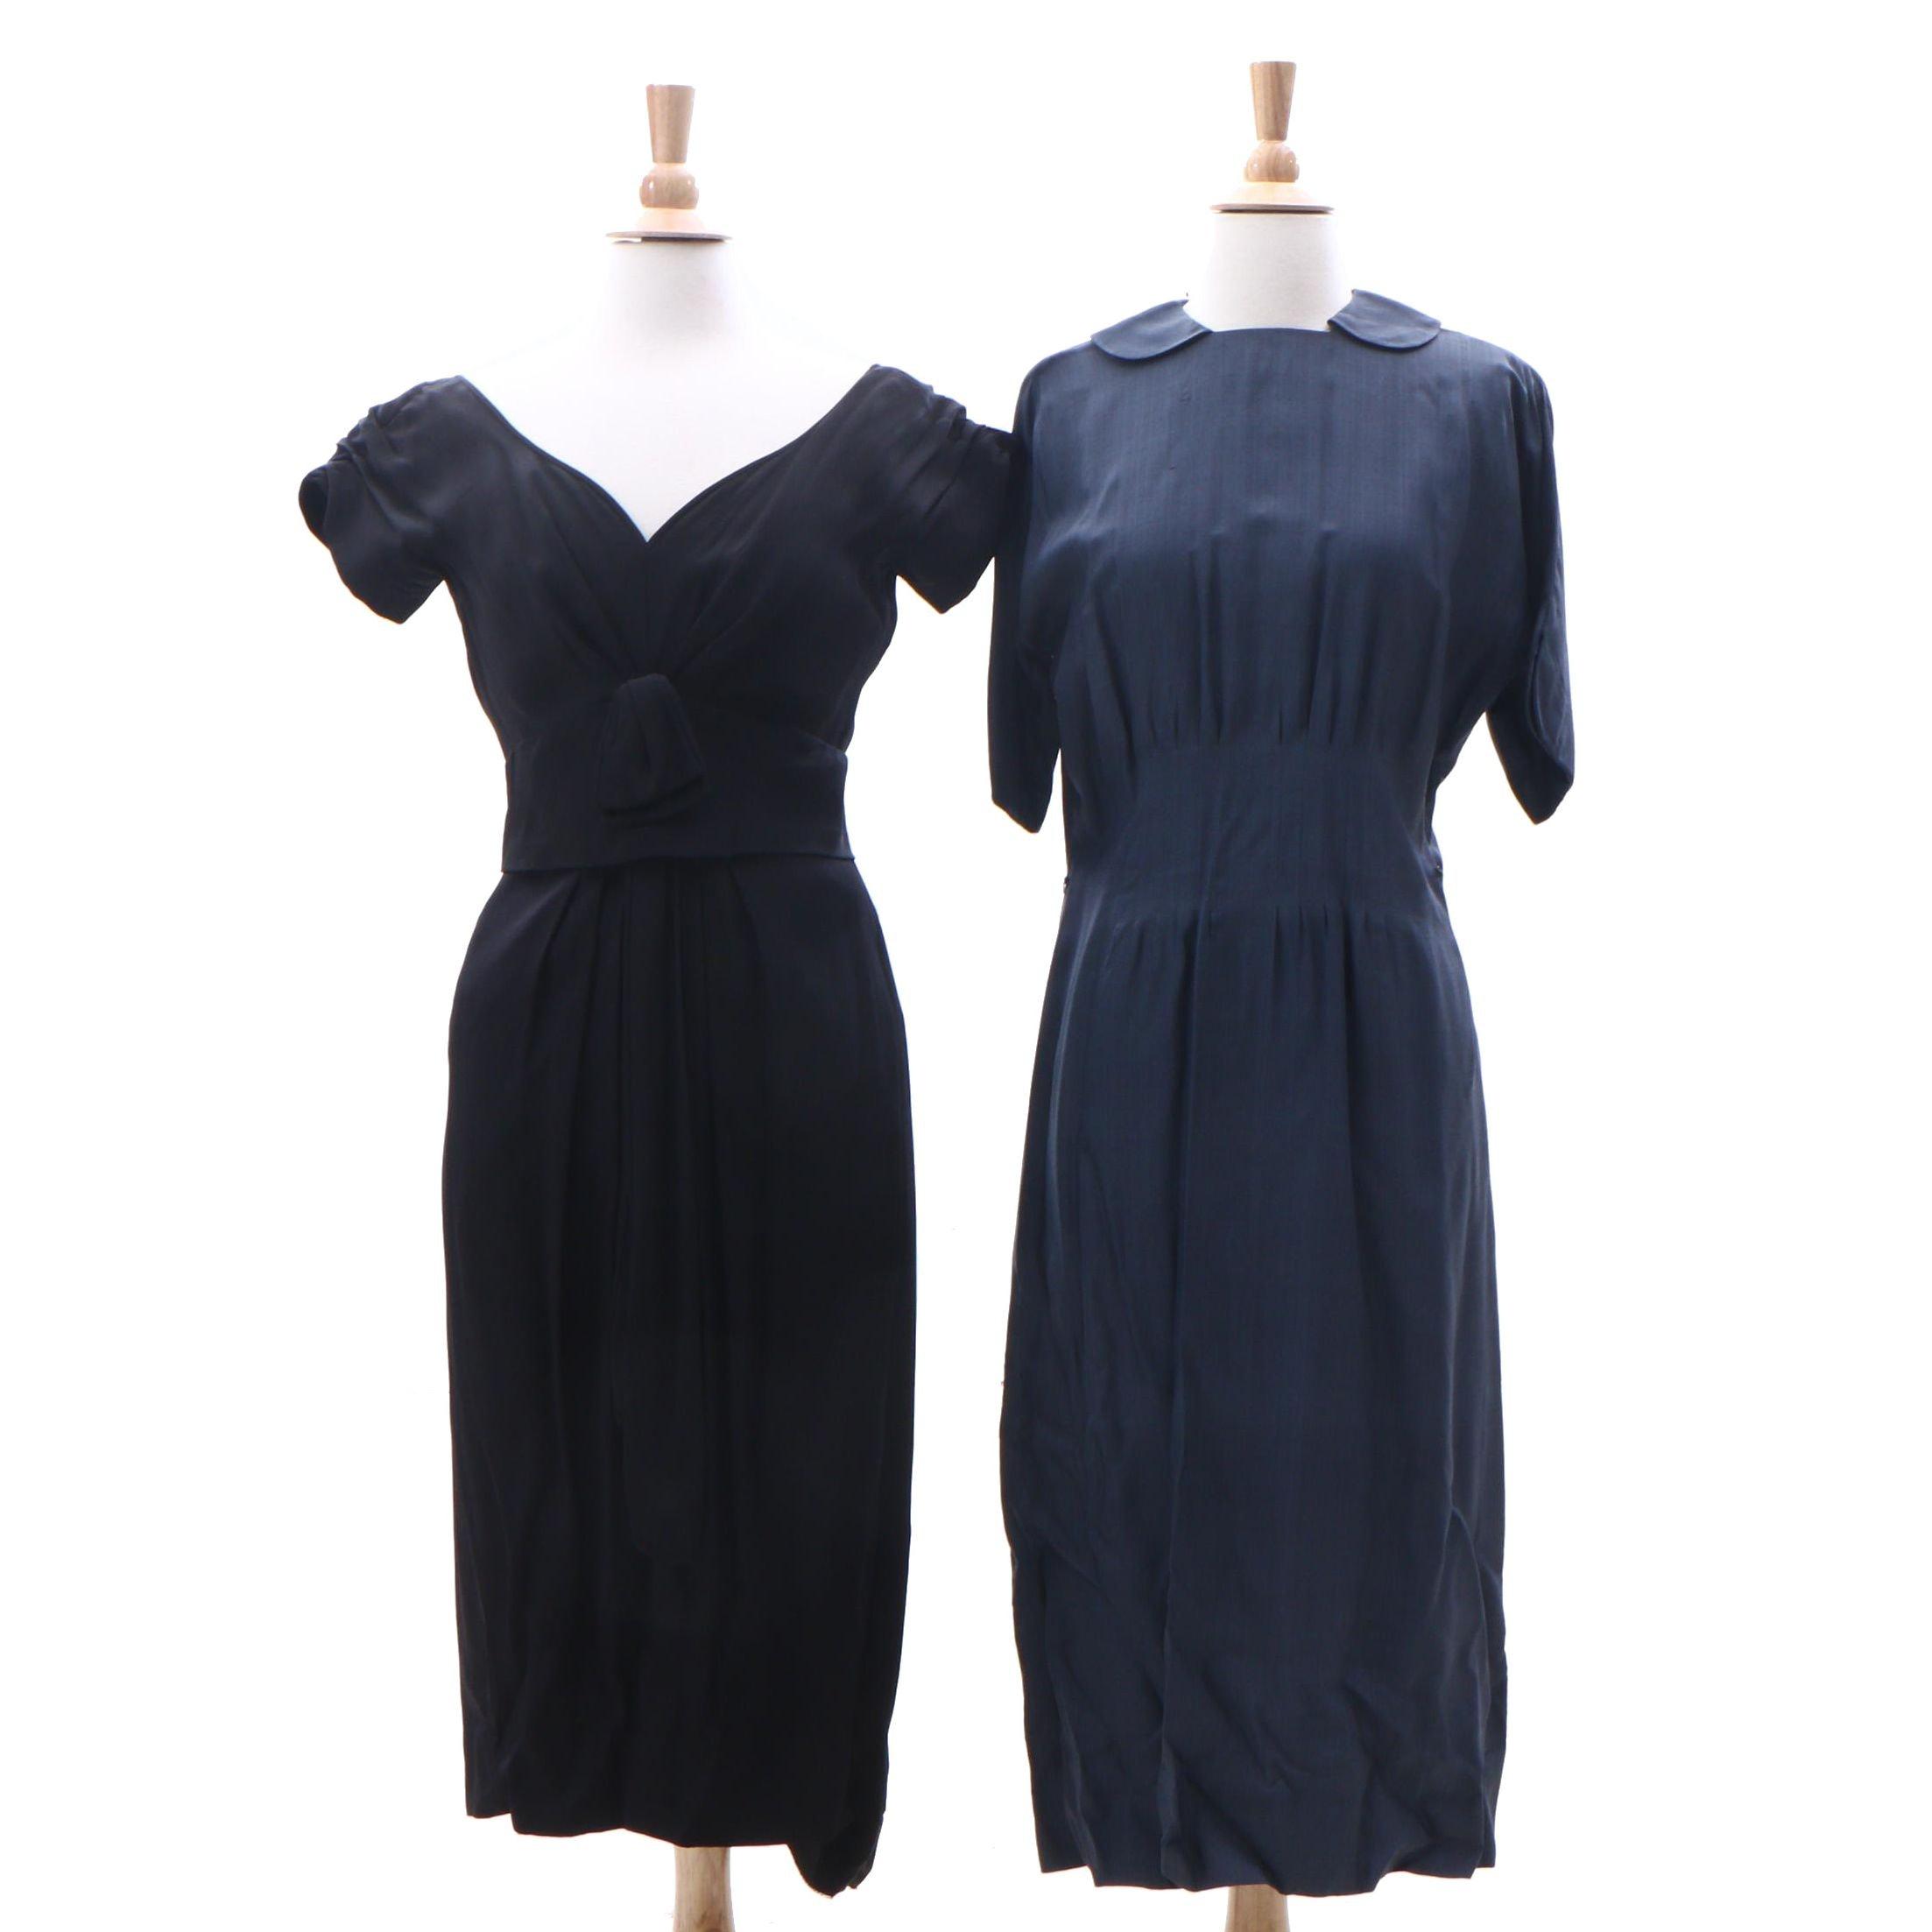 Bergdorf Goodman Black Silk Dress and Blue Uniform Style Dress, 1950s Vintage